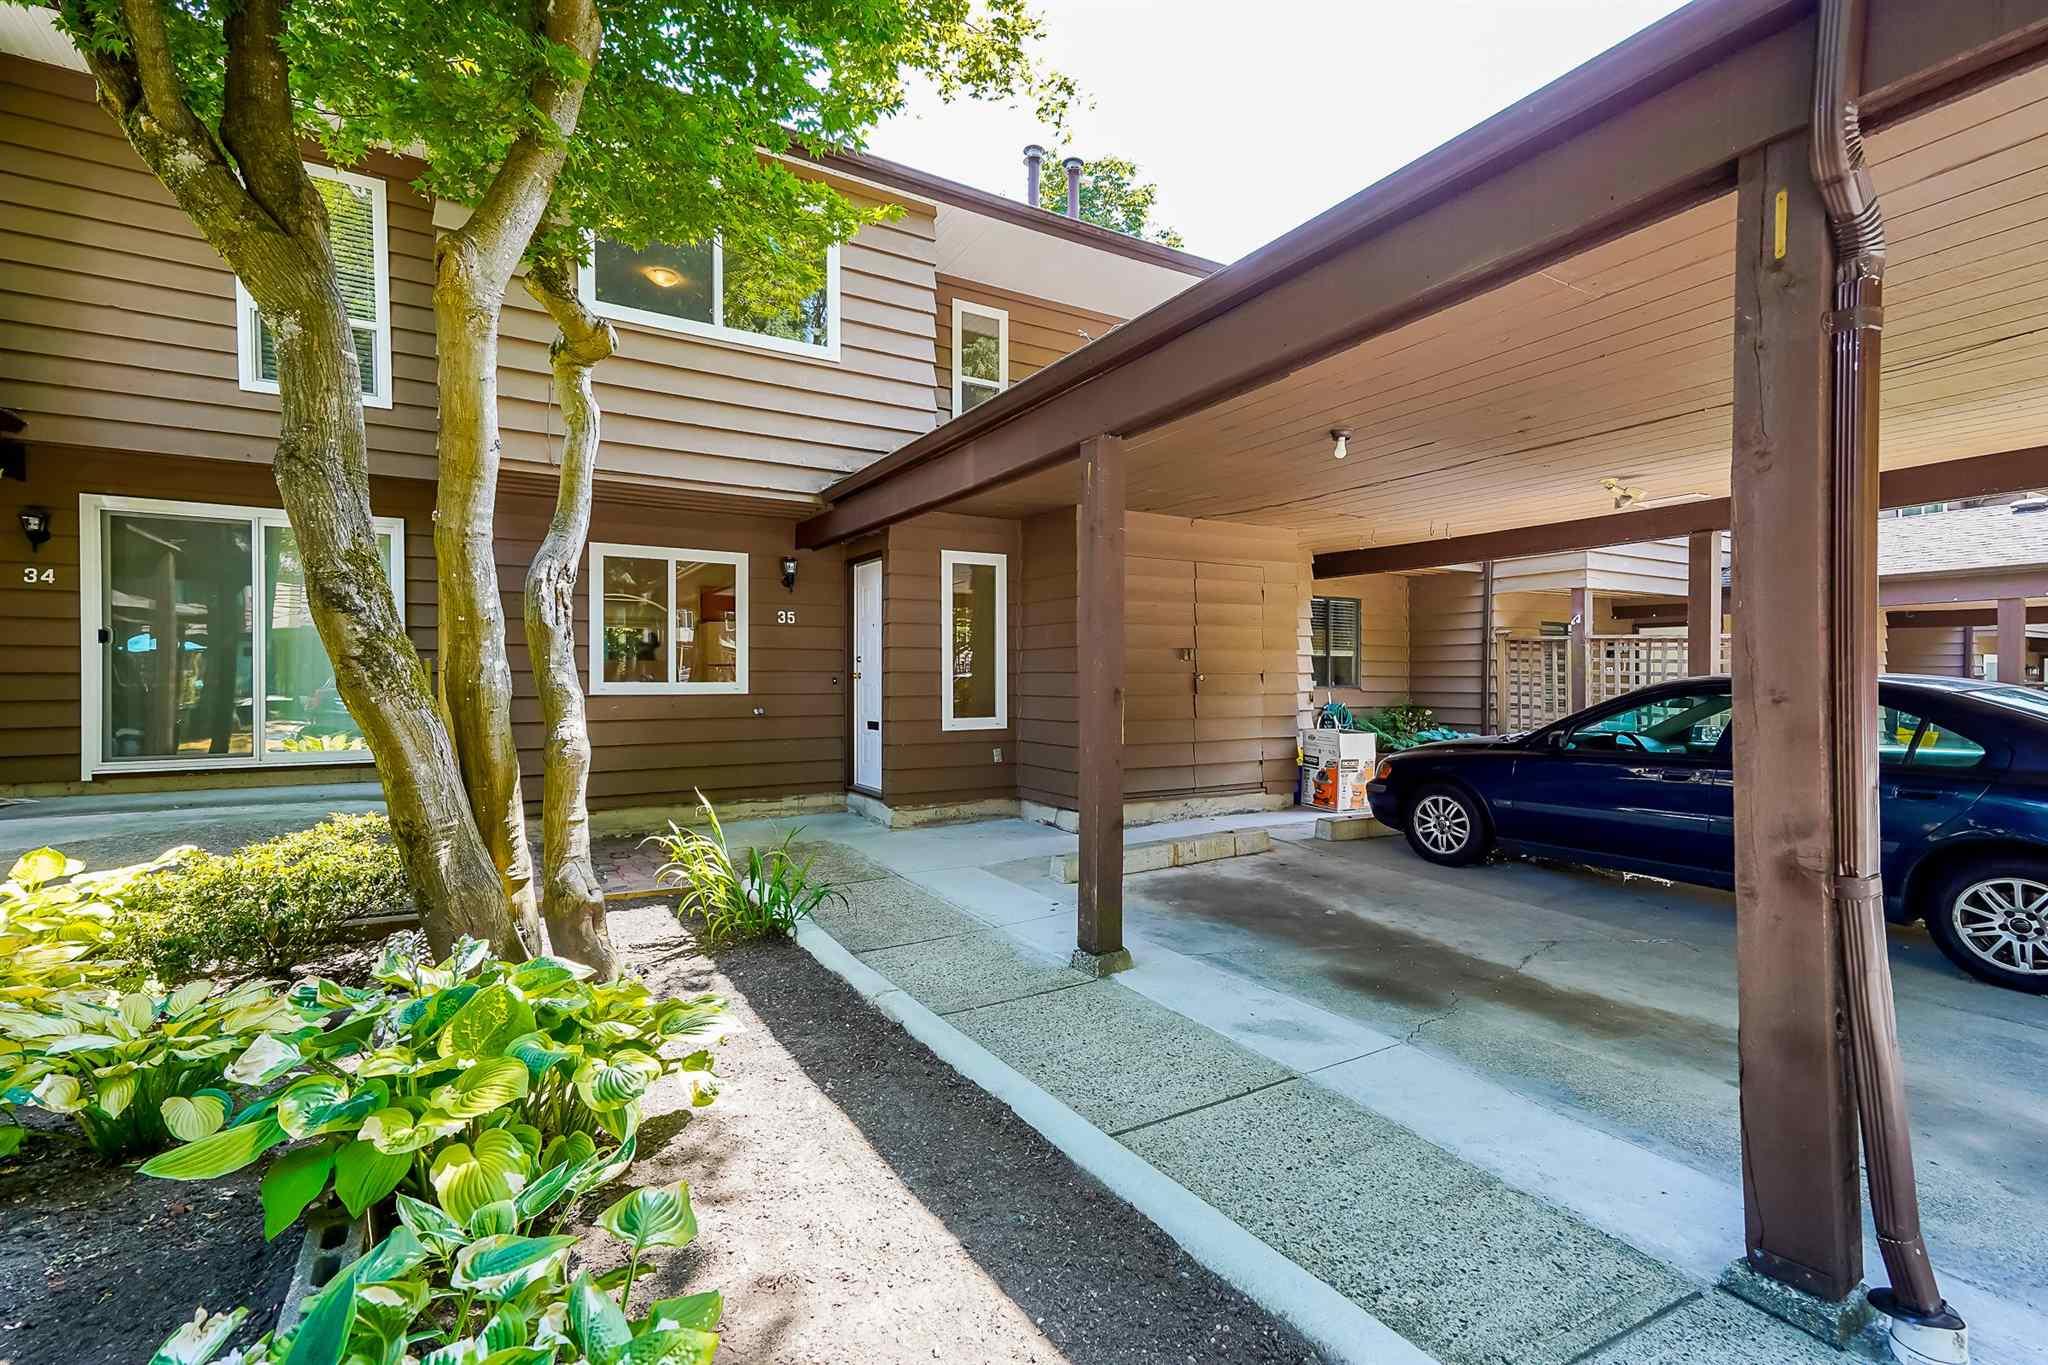 35 1140 EAGLERIDGE DRIVE - Eagle Ridge CQ Townhouse for sale, 3 Bedrooms (R2603398) - #1